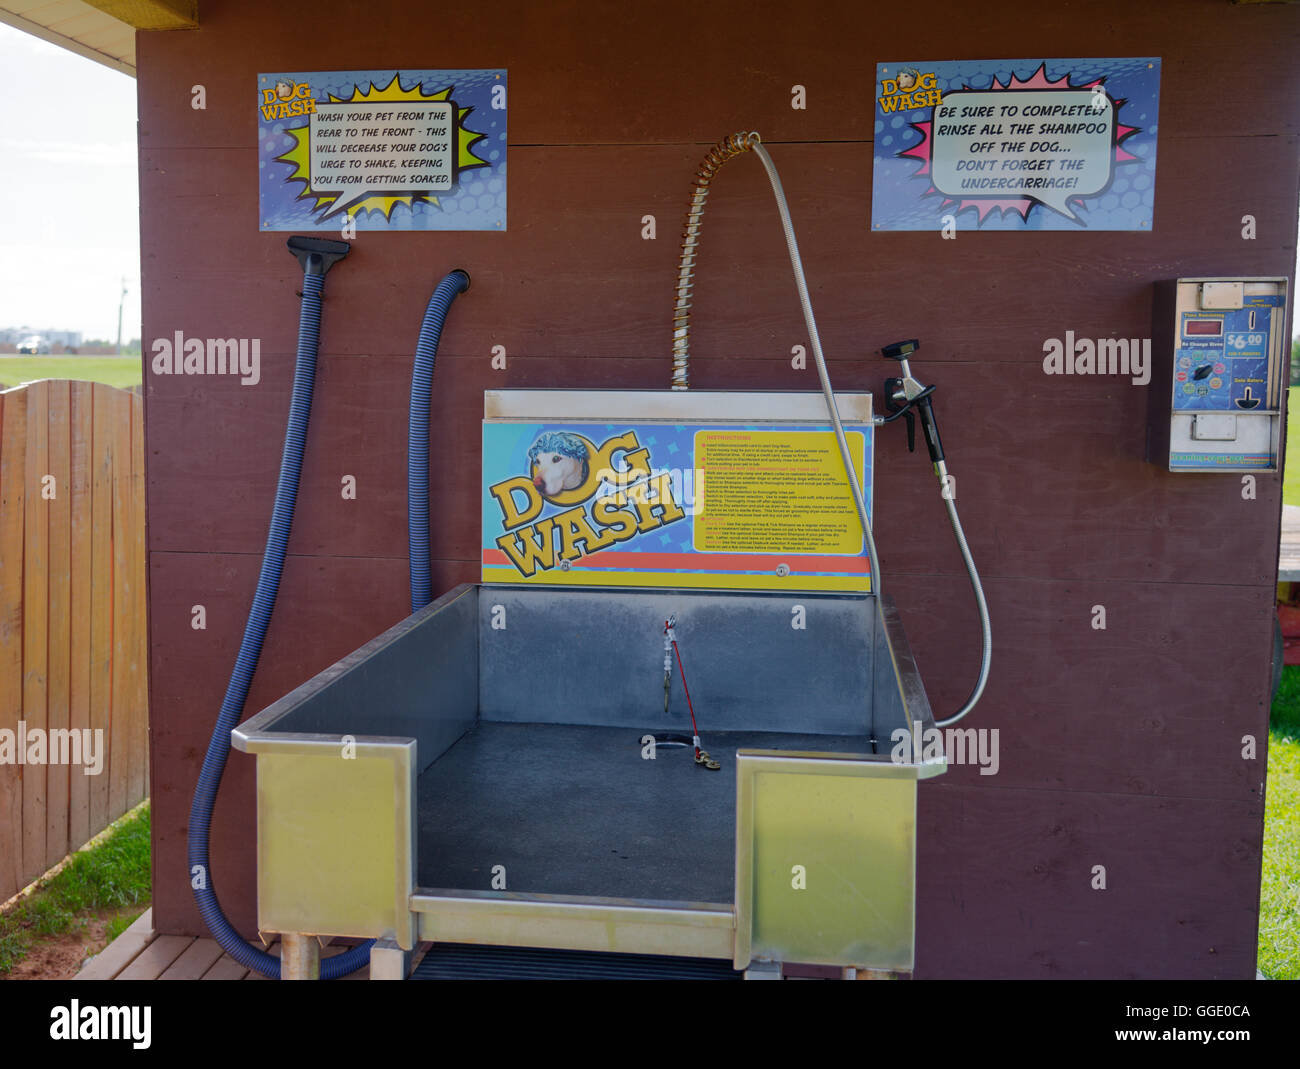 Dog wash station stock photo 113404378 alamy dog wash station solutioingenieria Gallery